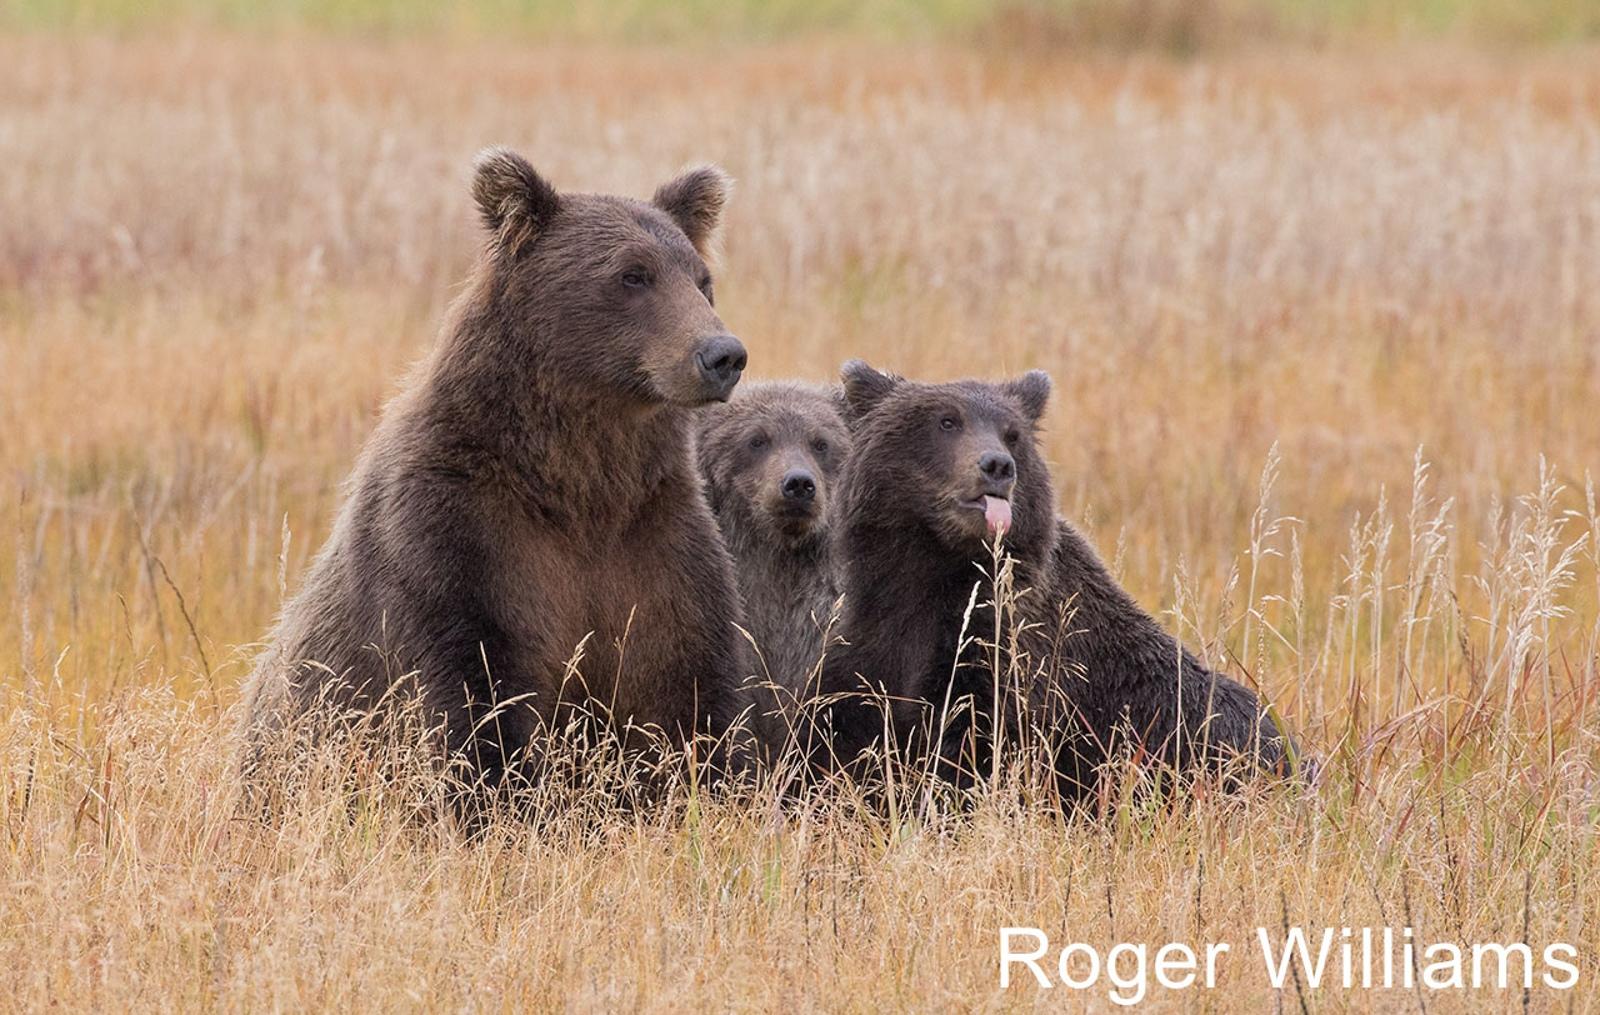 W1-08.The-three-bears